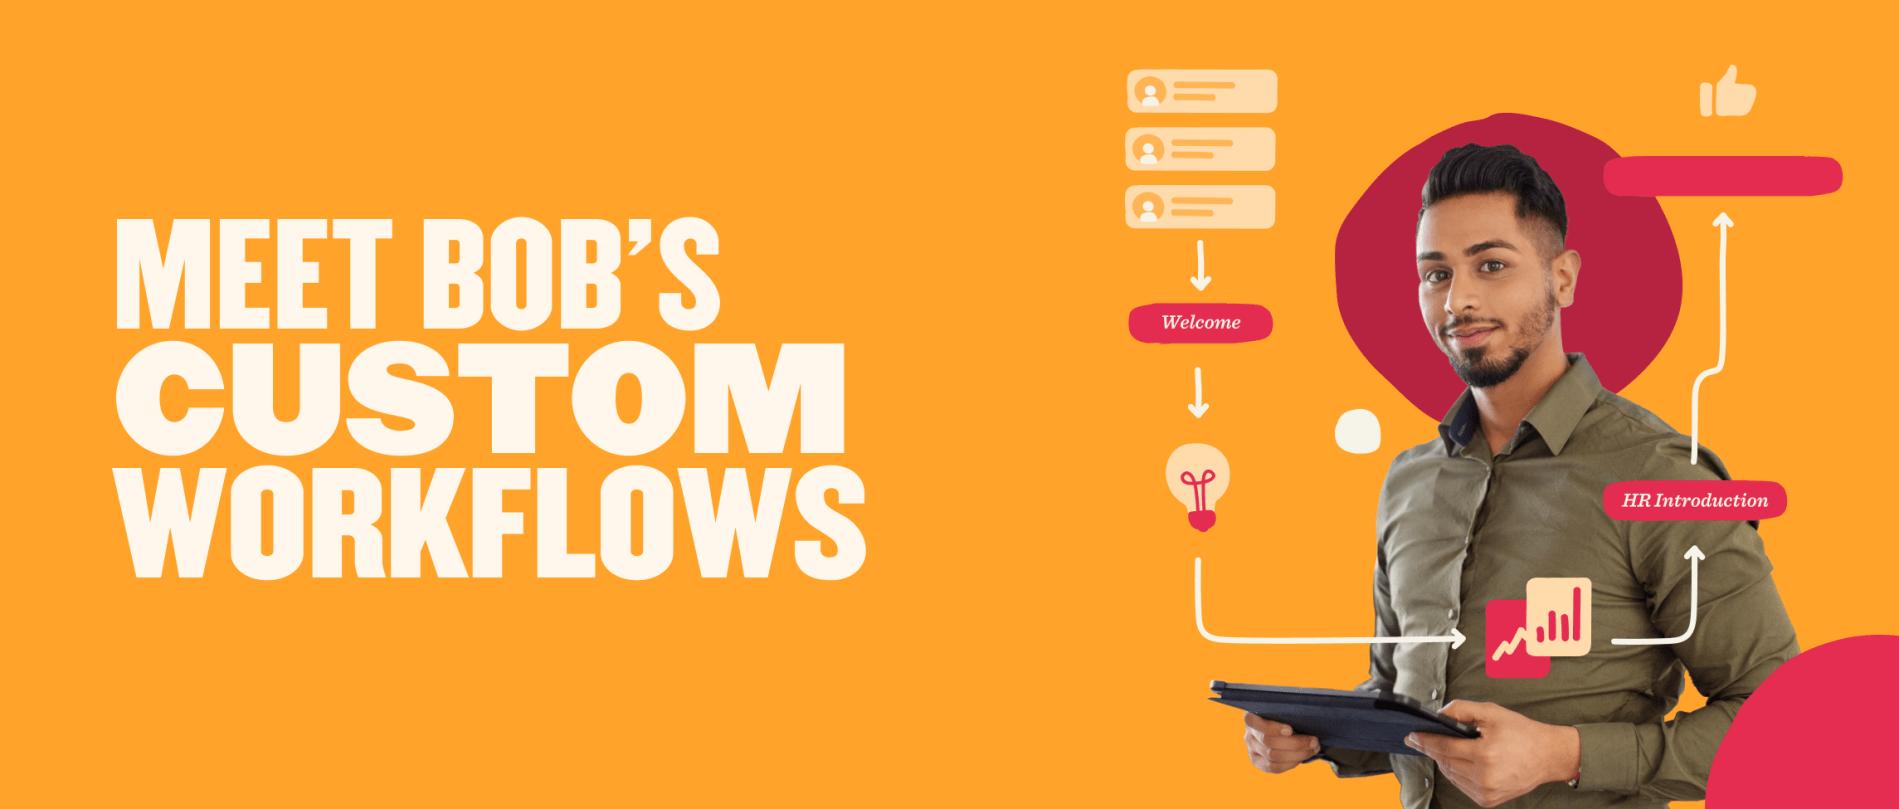 Meet bob's custom Workflows